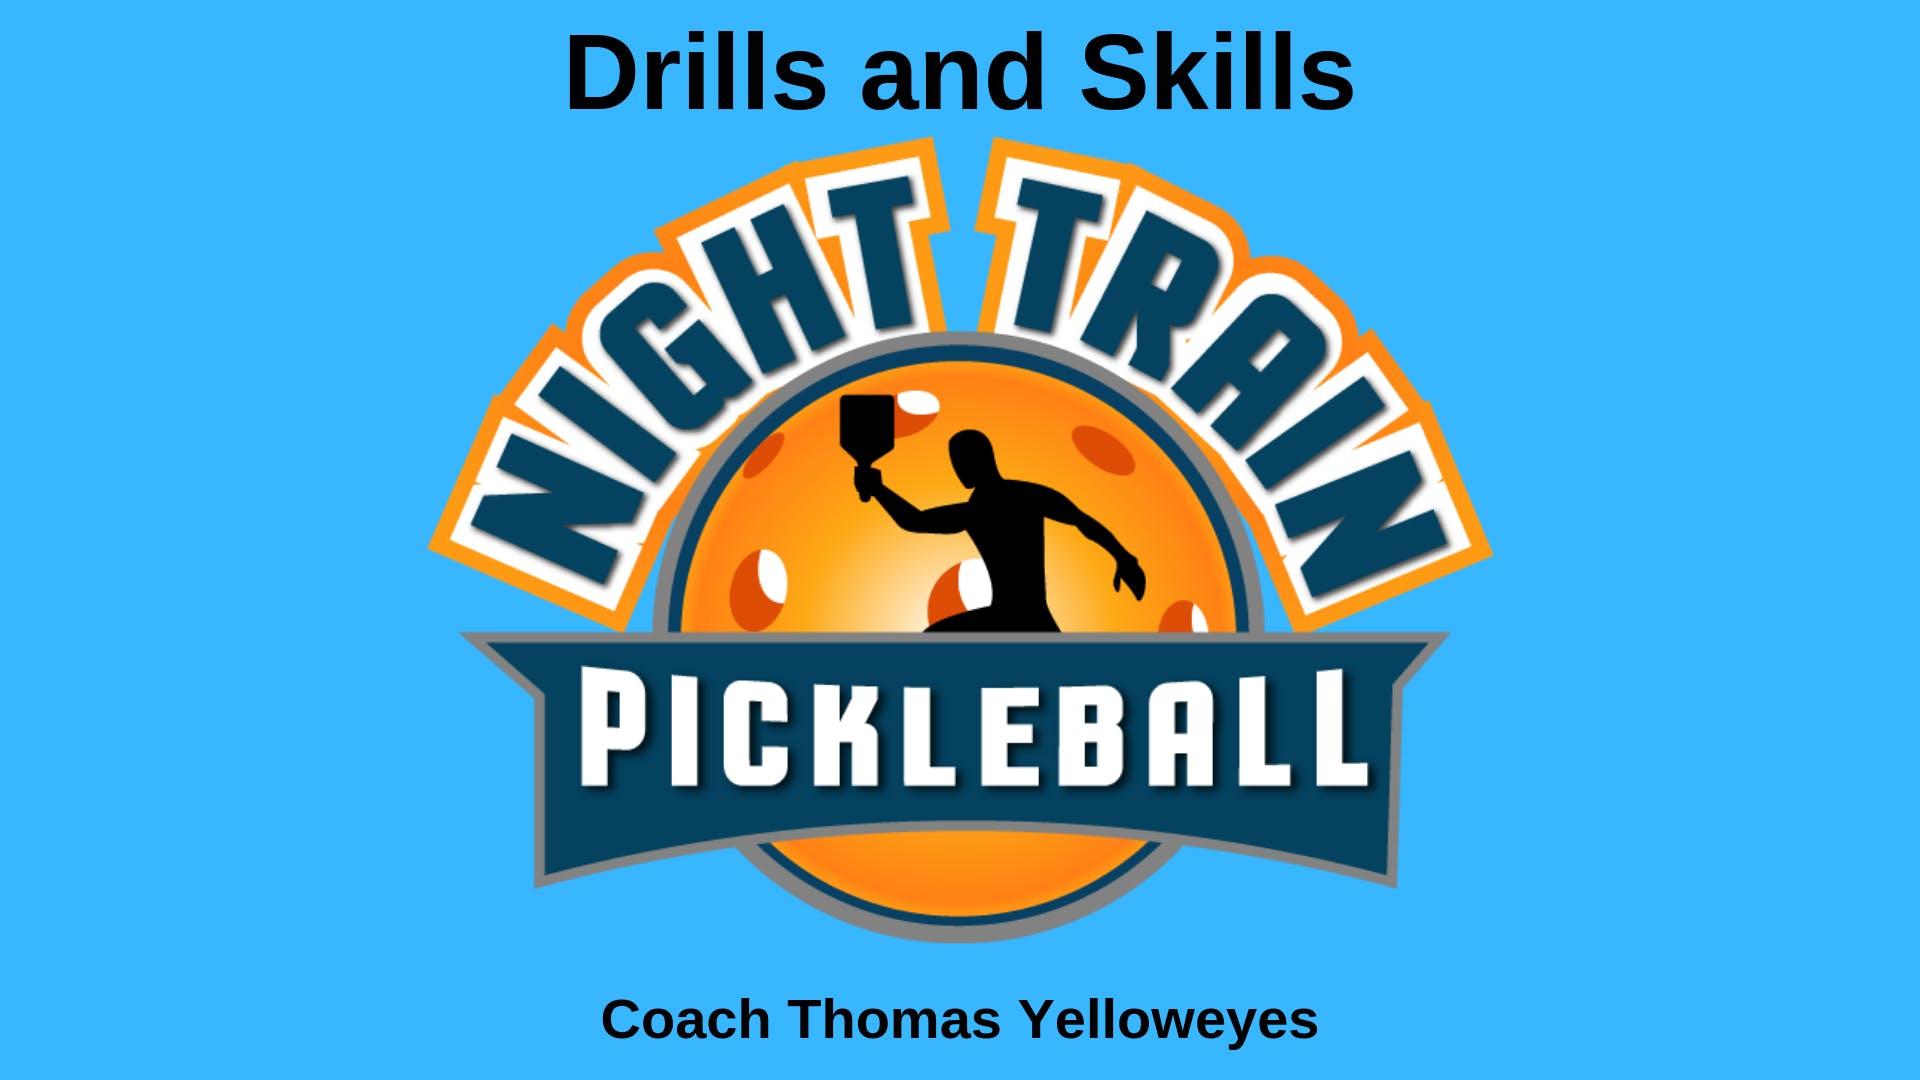 Drills and Skills